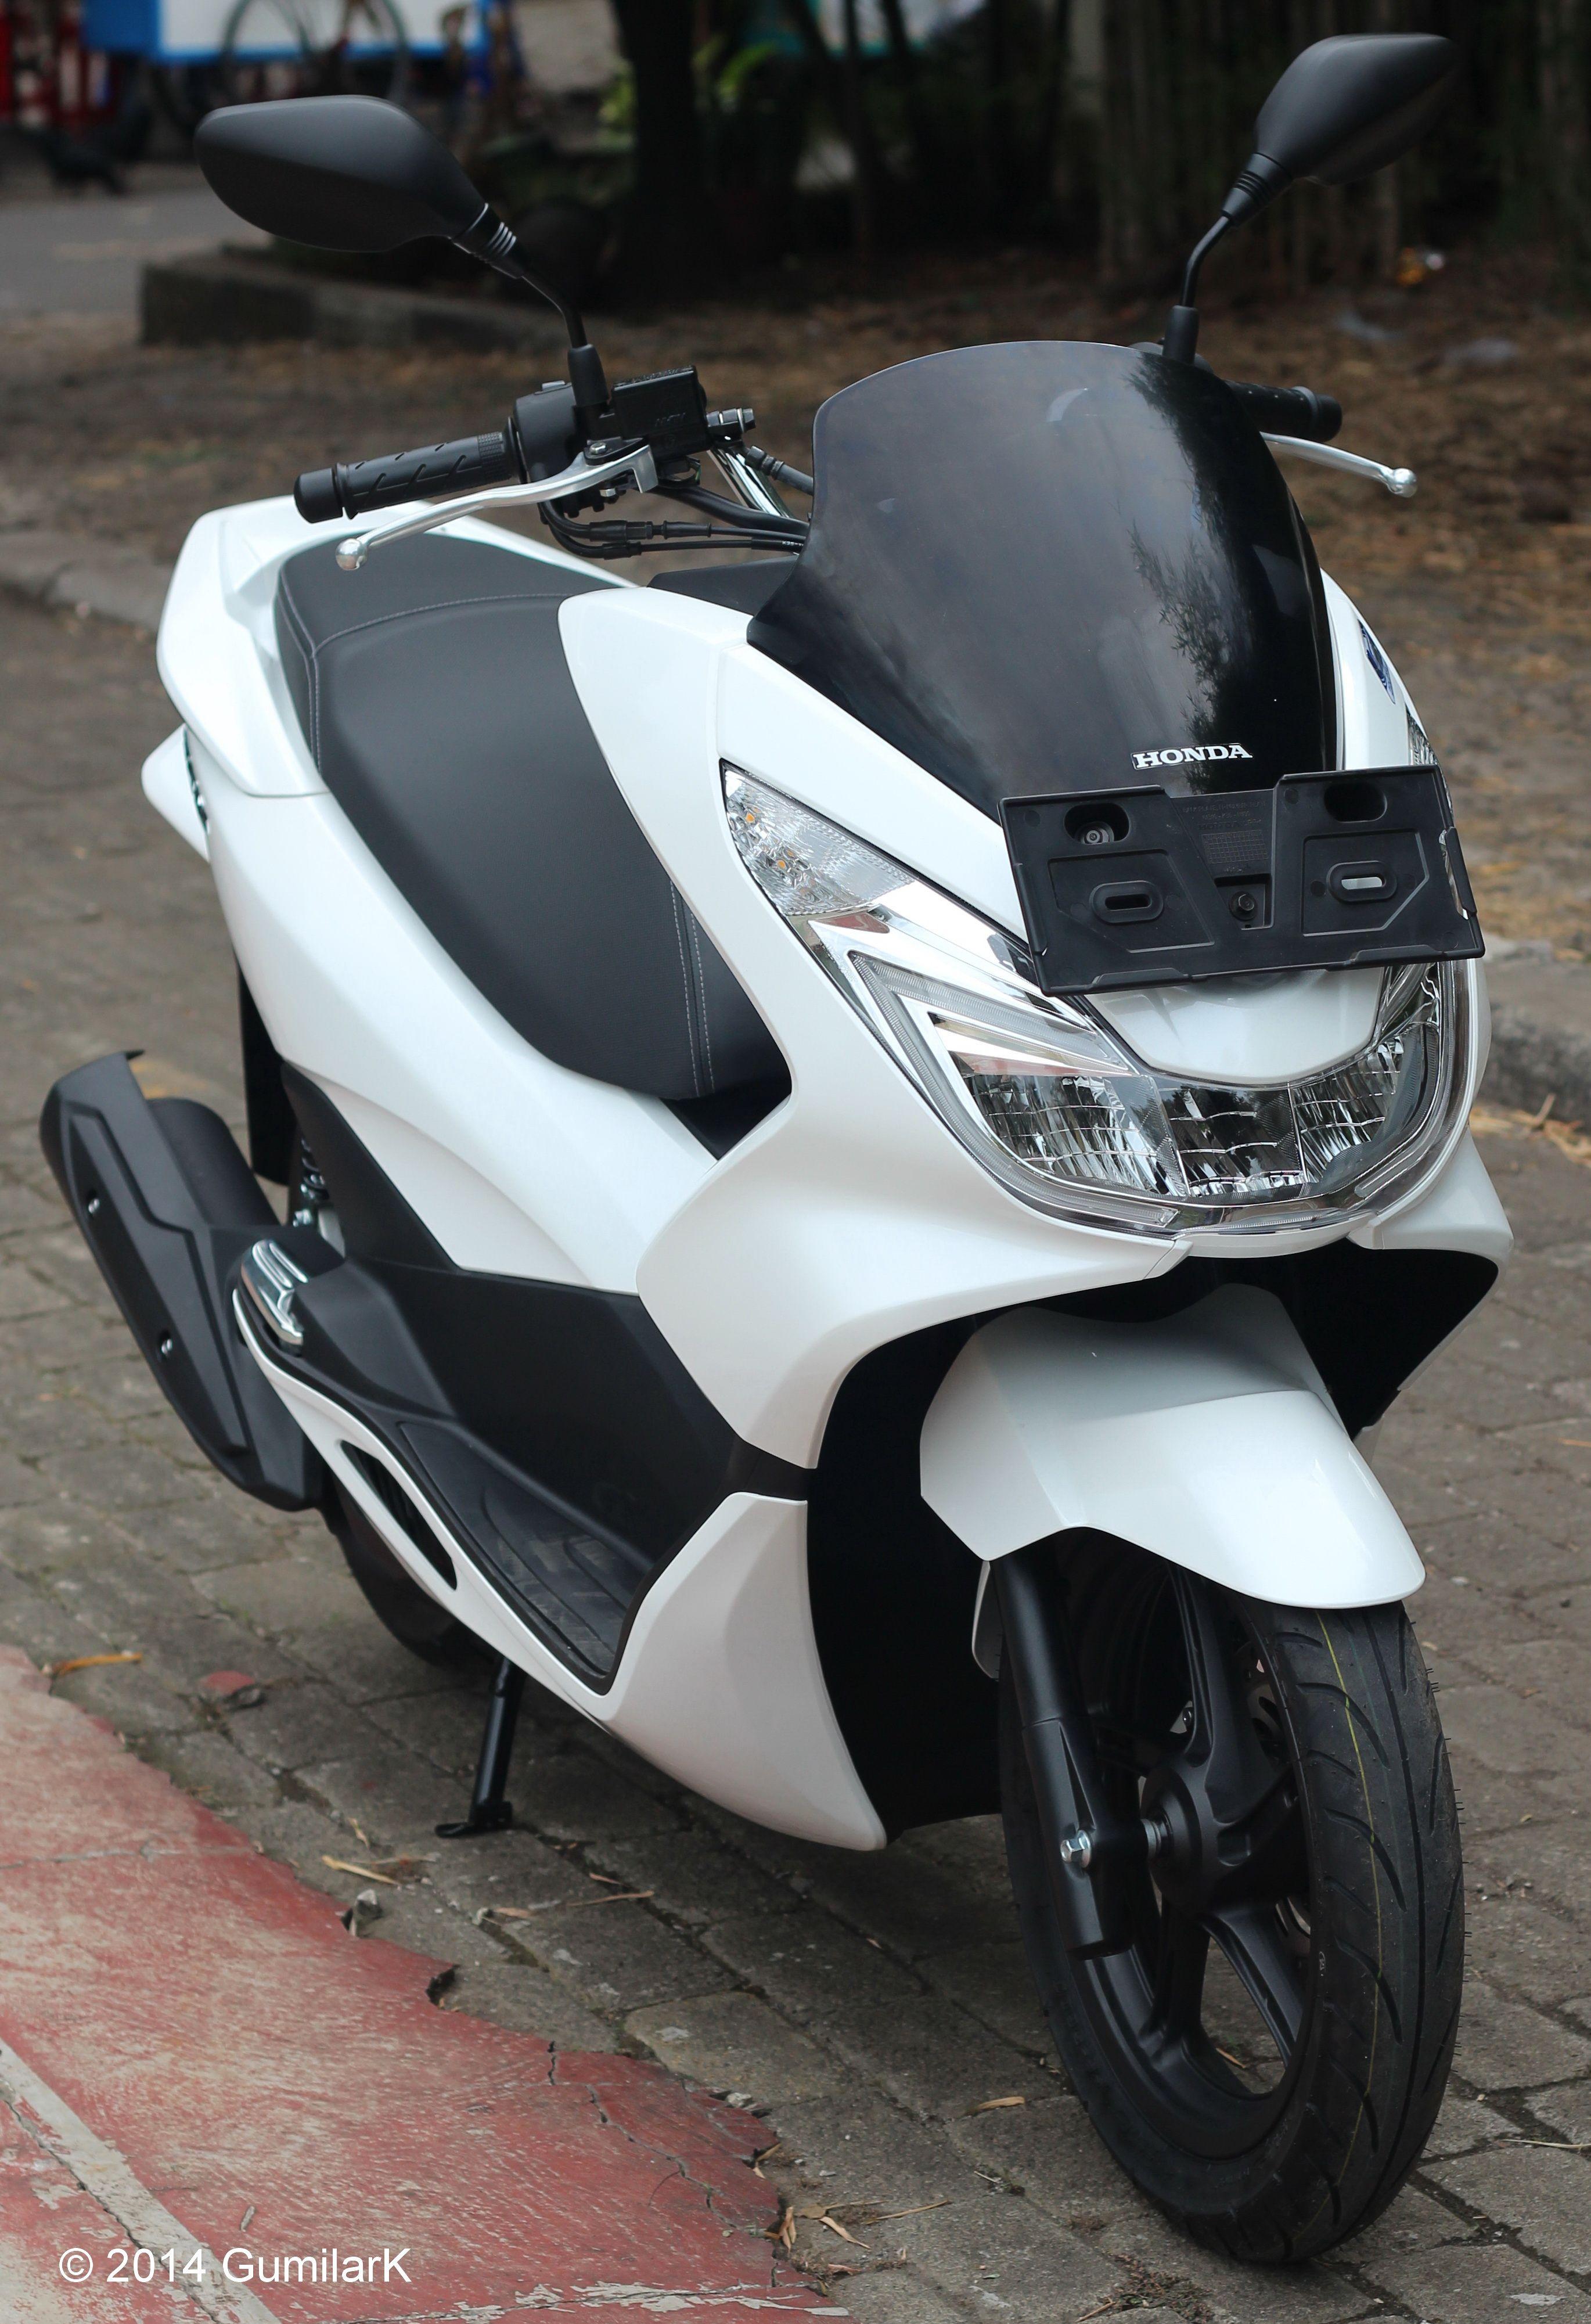 Honda Pcx Ready Stock Bandung on honda phantom, honda win, honda cd, honda lead, honda tif, honda cmx, honda art, honda moped, honda helix, honda hdr, honda sh150i, honda cbr, honda scooter,